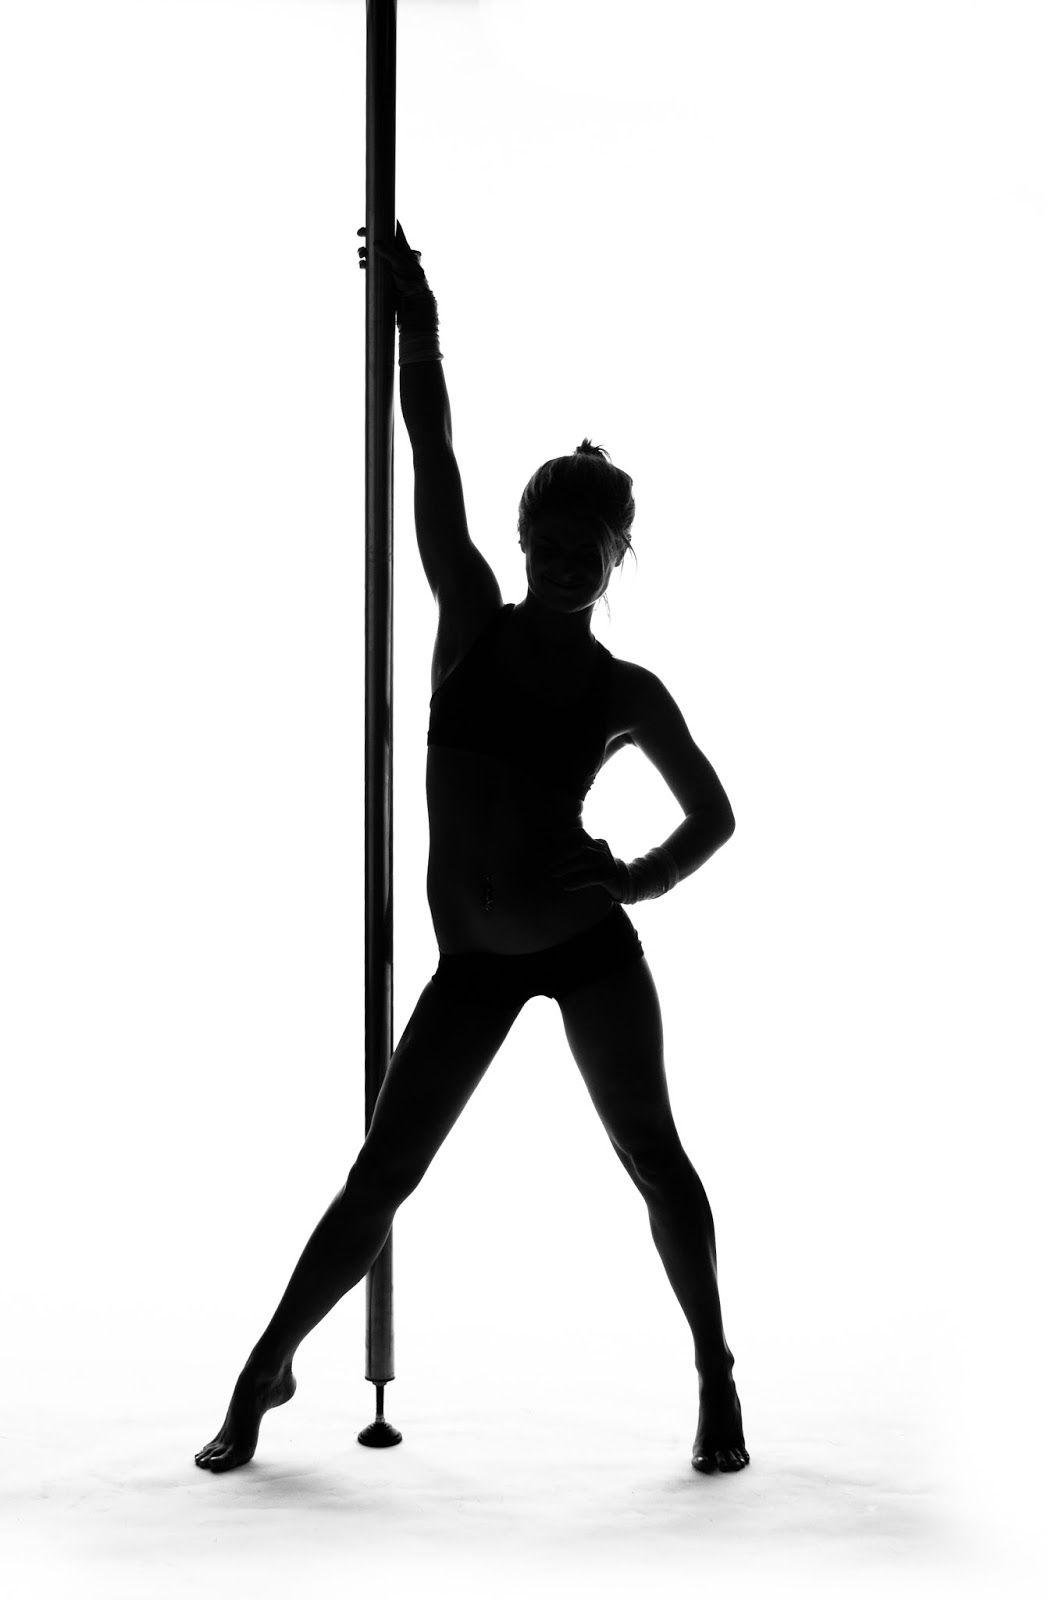 Pix For Pole Dance Silhouette.